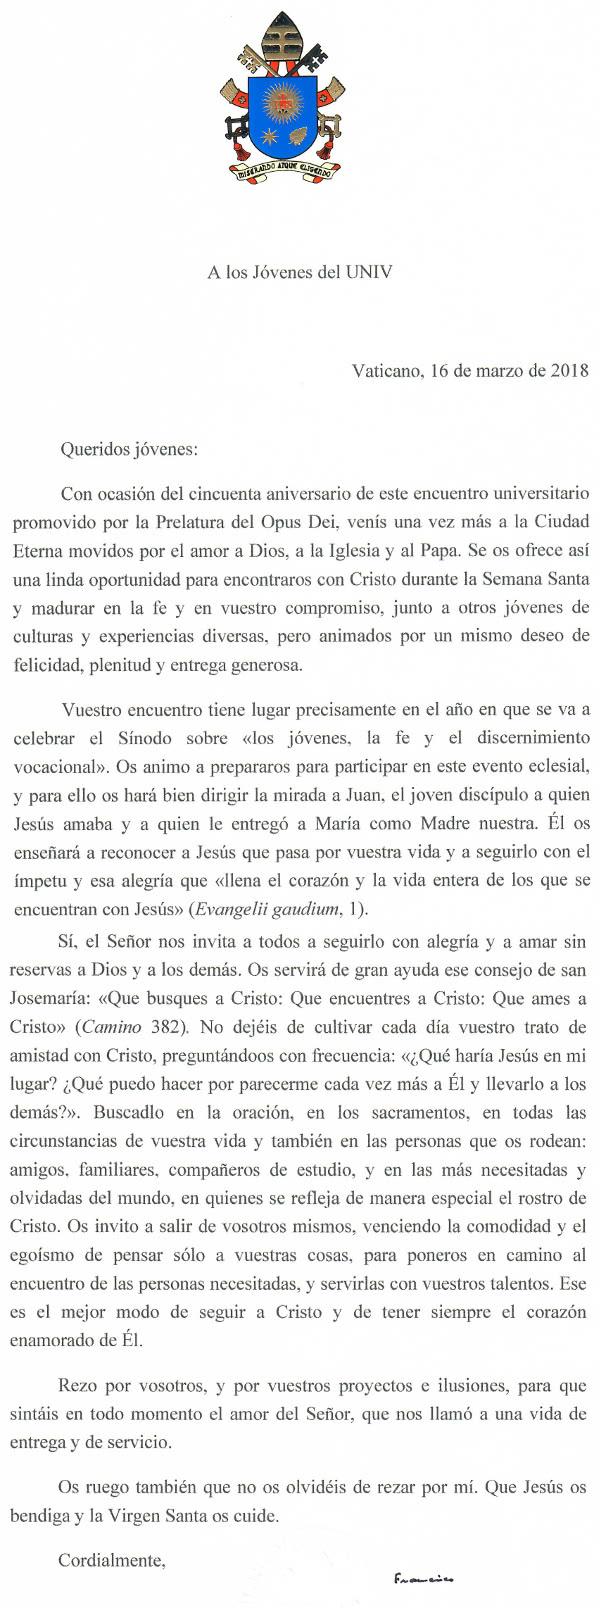 letter to UNIV